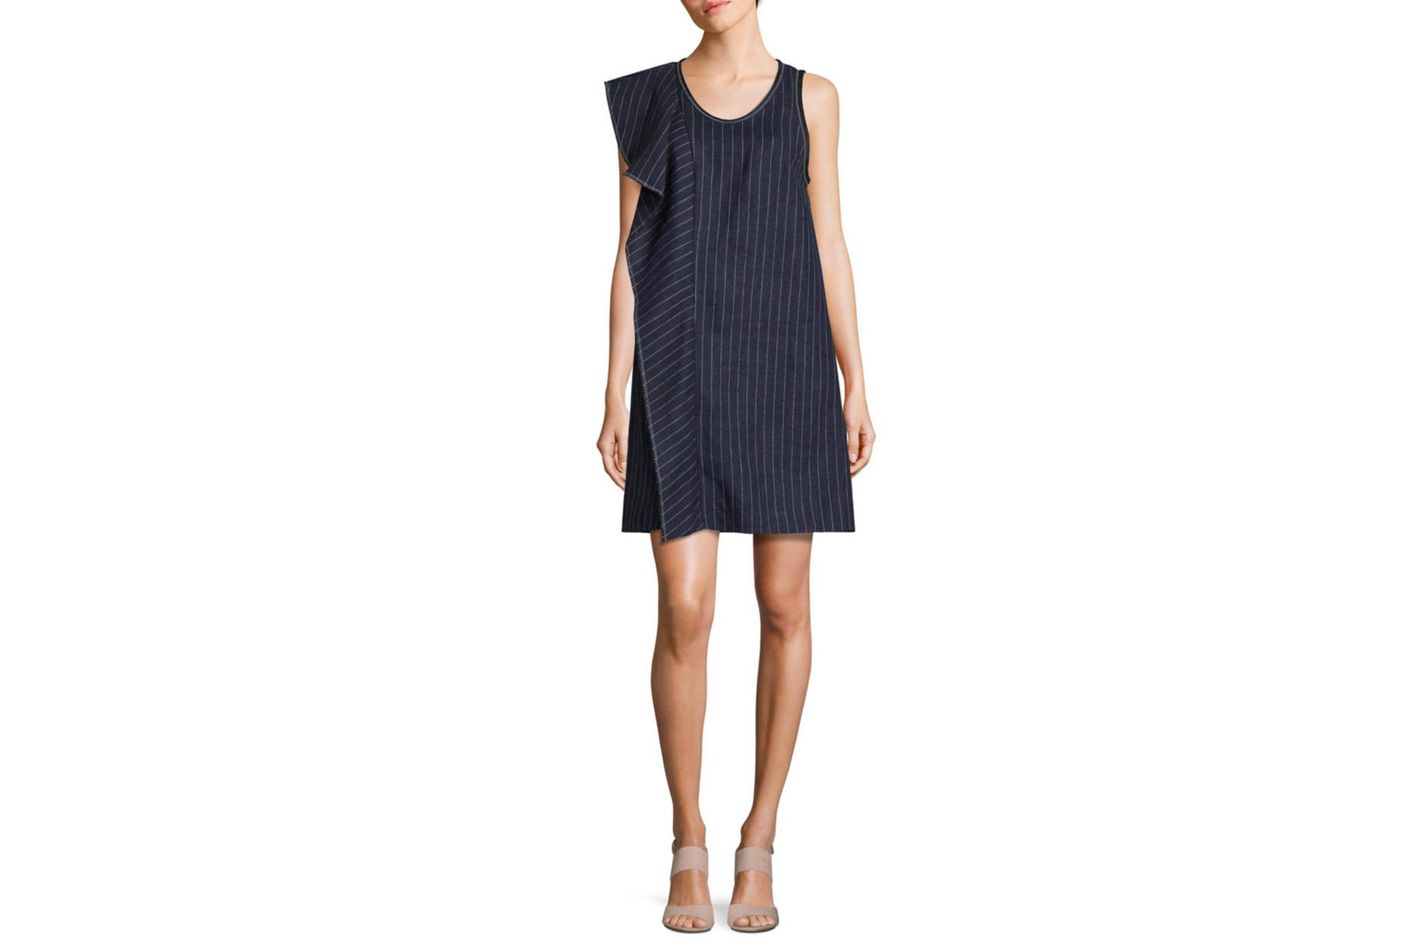 3.1 Phillip Lim Pinstripe A-Line Dress